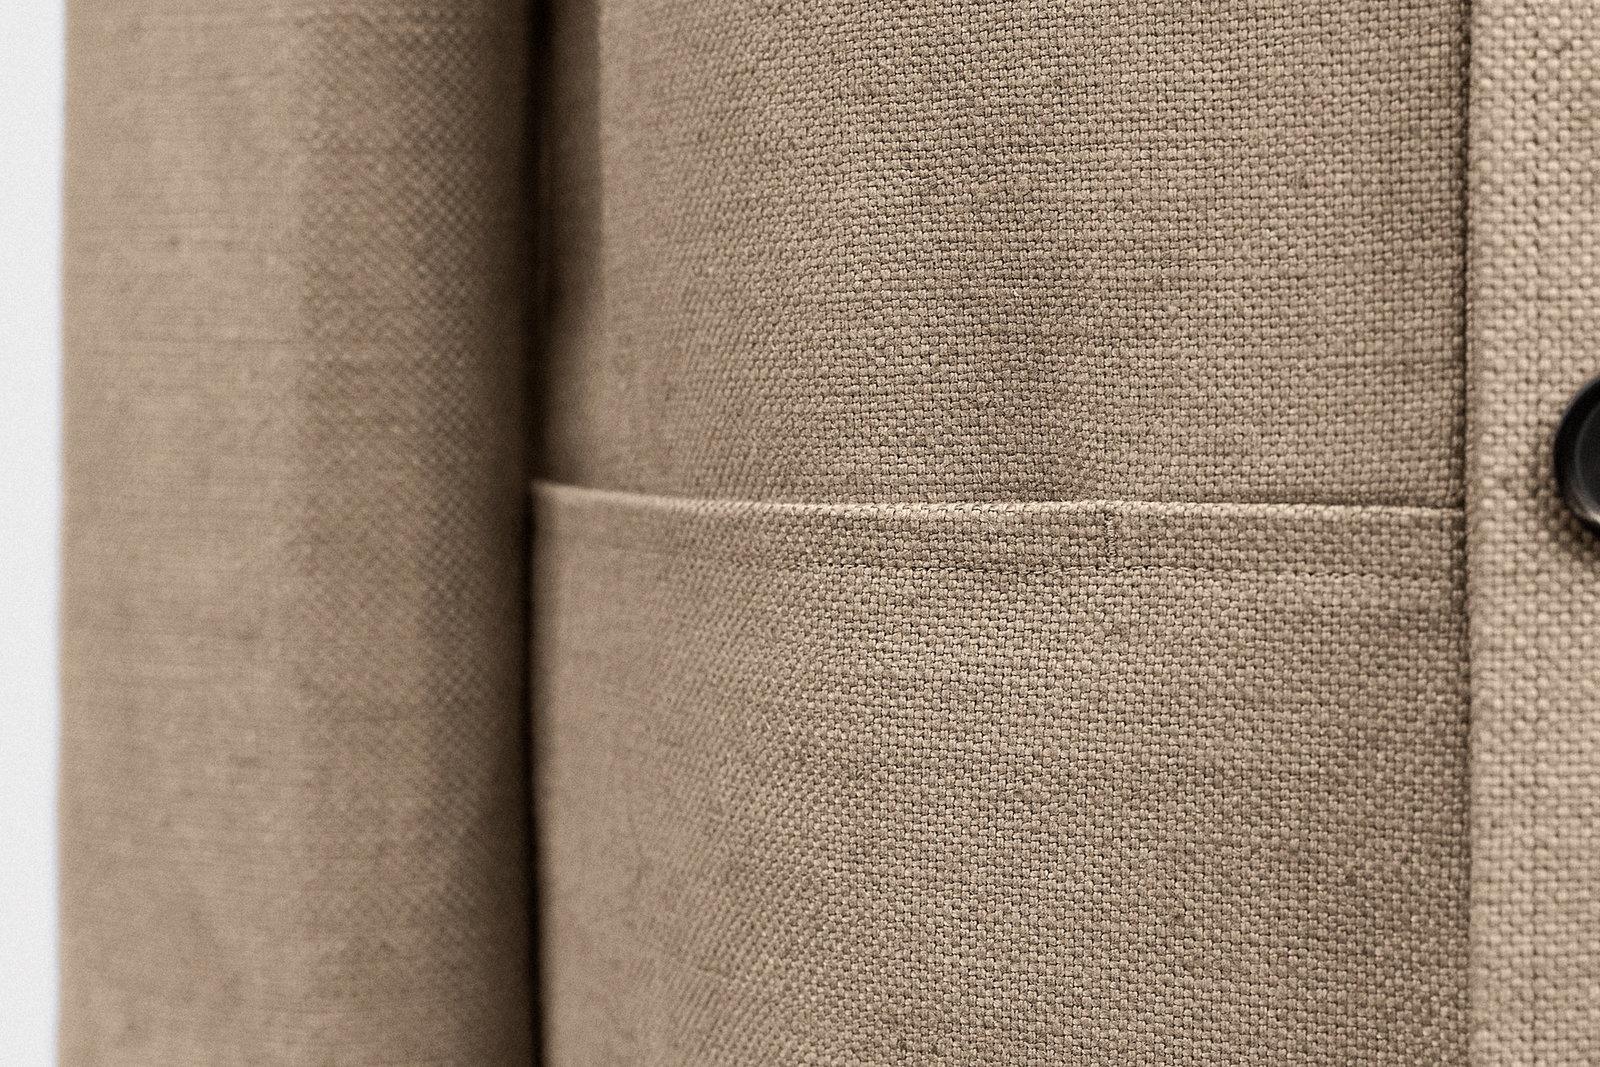 shopcoat-cotton-linen-hopsack-malt-6@2x.jpg